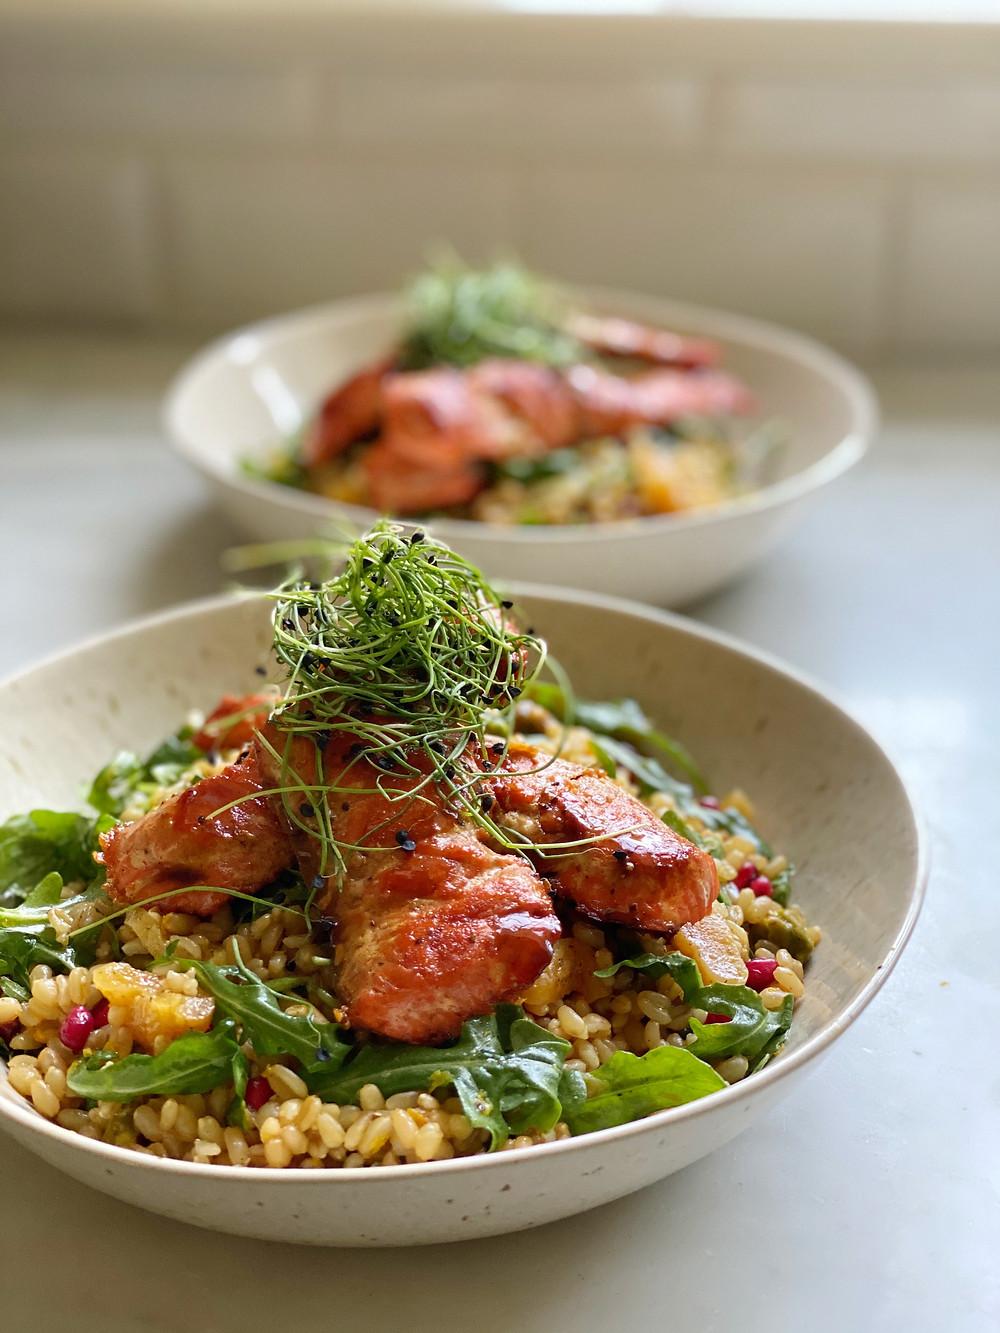 Seared Sockeye Salmon on Wheat Berry Salad